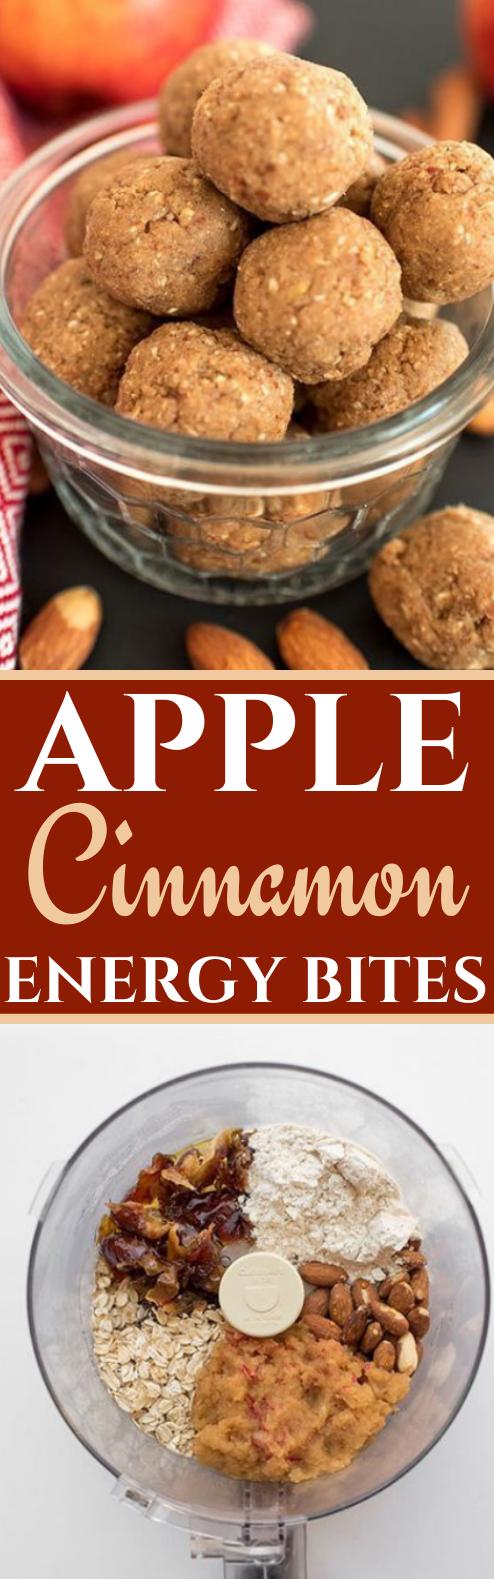 Apple Cinnamon Energy Balls #healthy #breakfast #snacks #keto #vegetarian